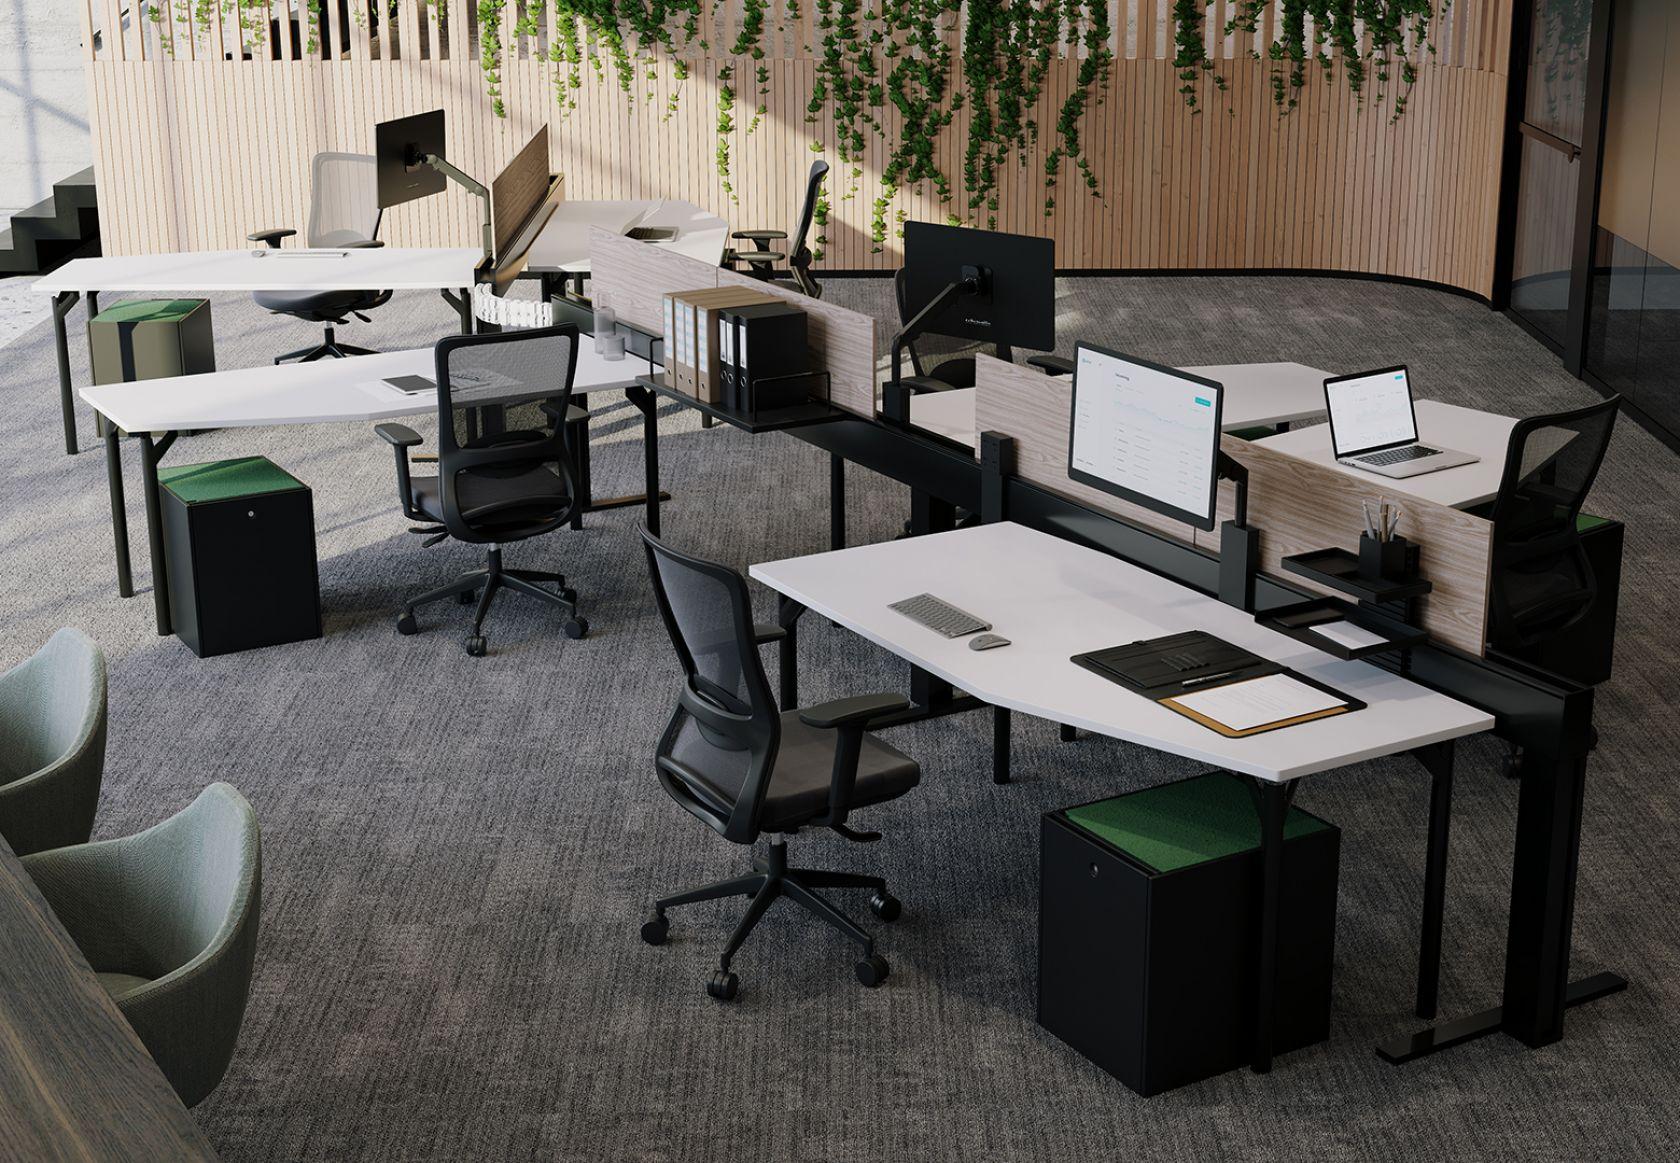 04_Climate_Corporate_Workspace_Organic-Dash-Chair.jpg